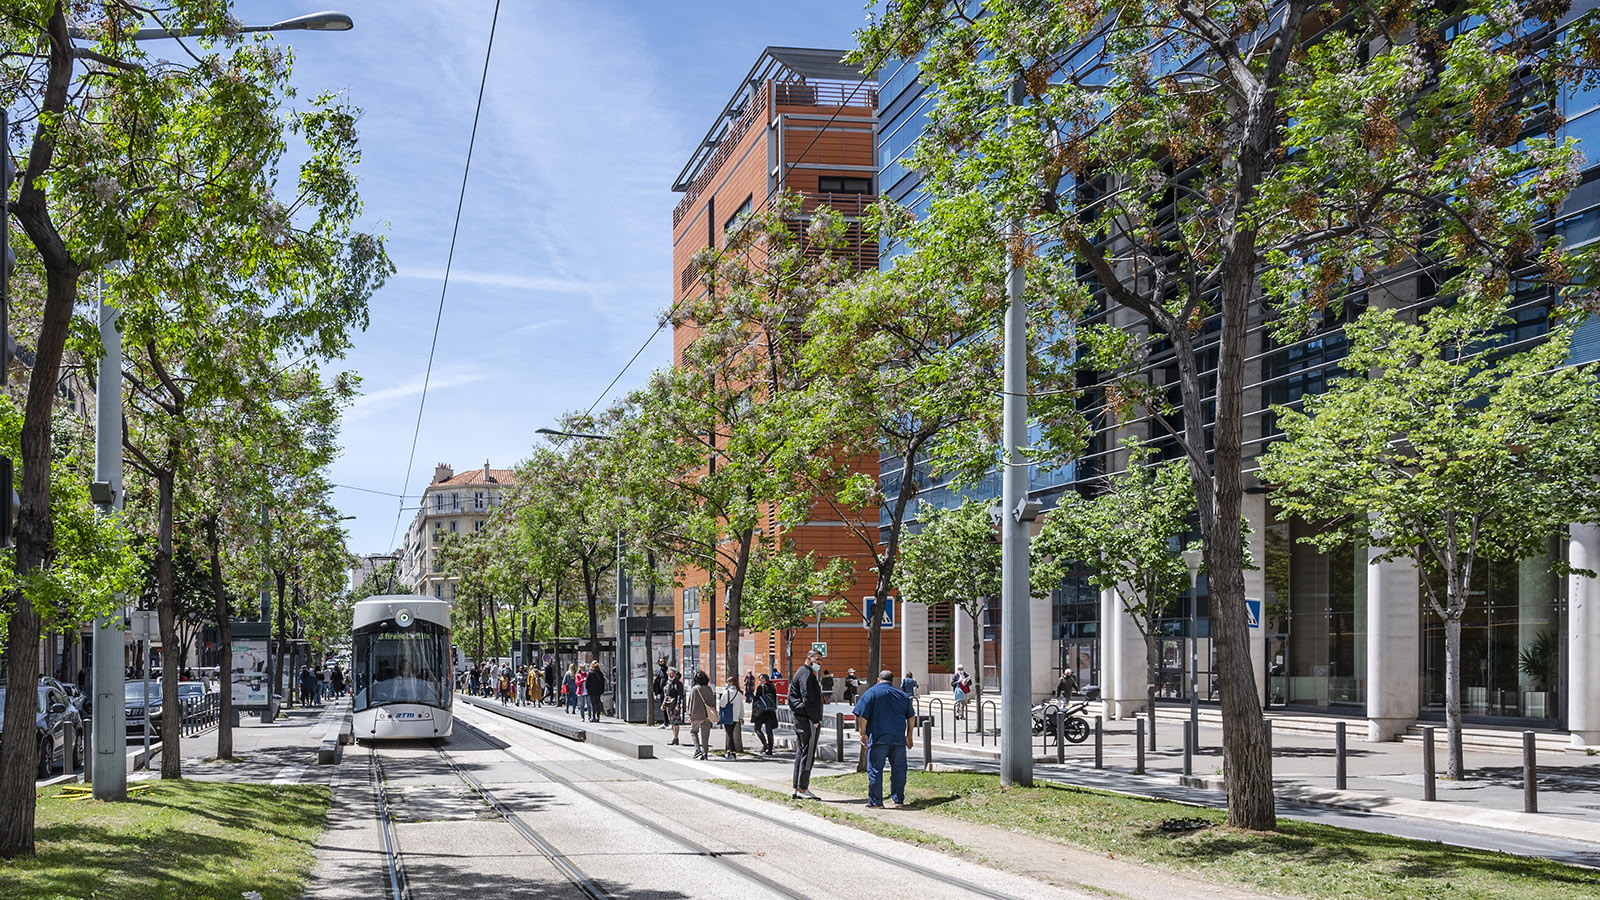 Von der Rue de la République bringt euch die Straßenbahn zur Euroméditerranée. Foto: Hilke Maunder